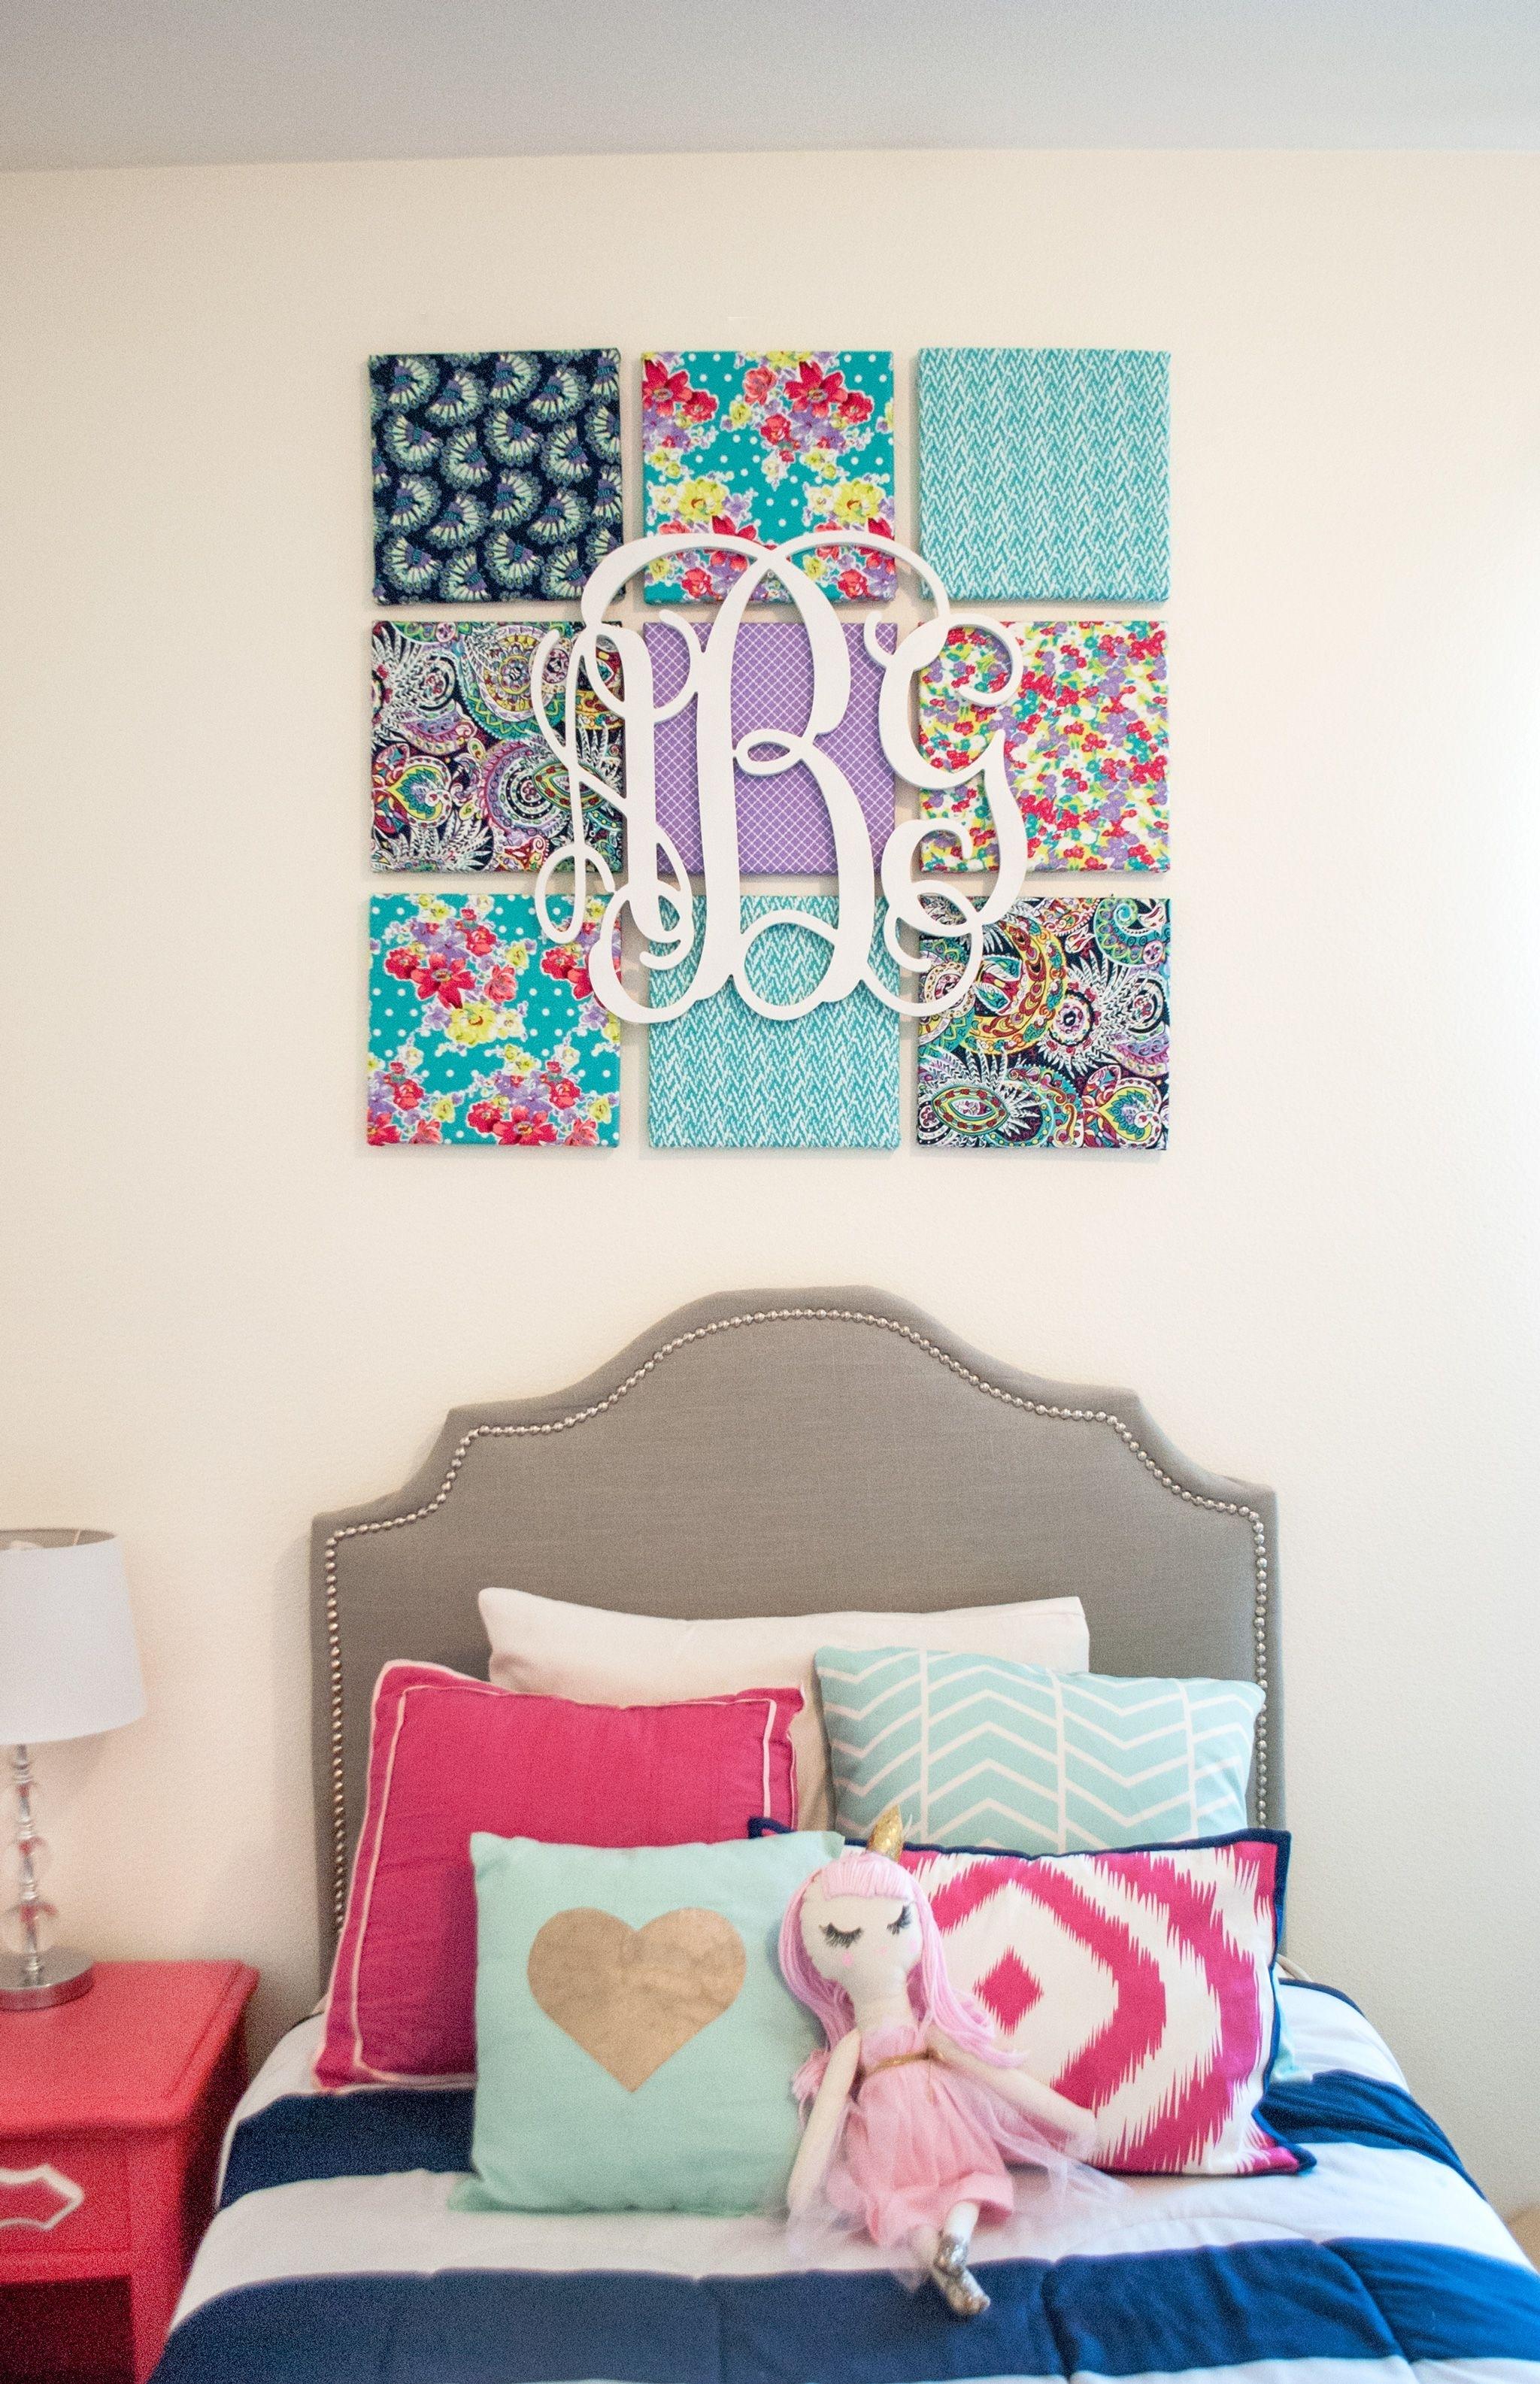 Diy Fabric Wall Art | Children's Room Diy Ideas | Pinterest inside Monogram Wall Art (Image 2 of 20)